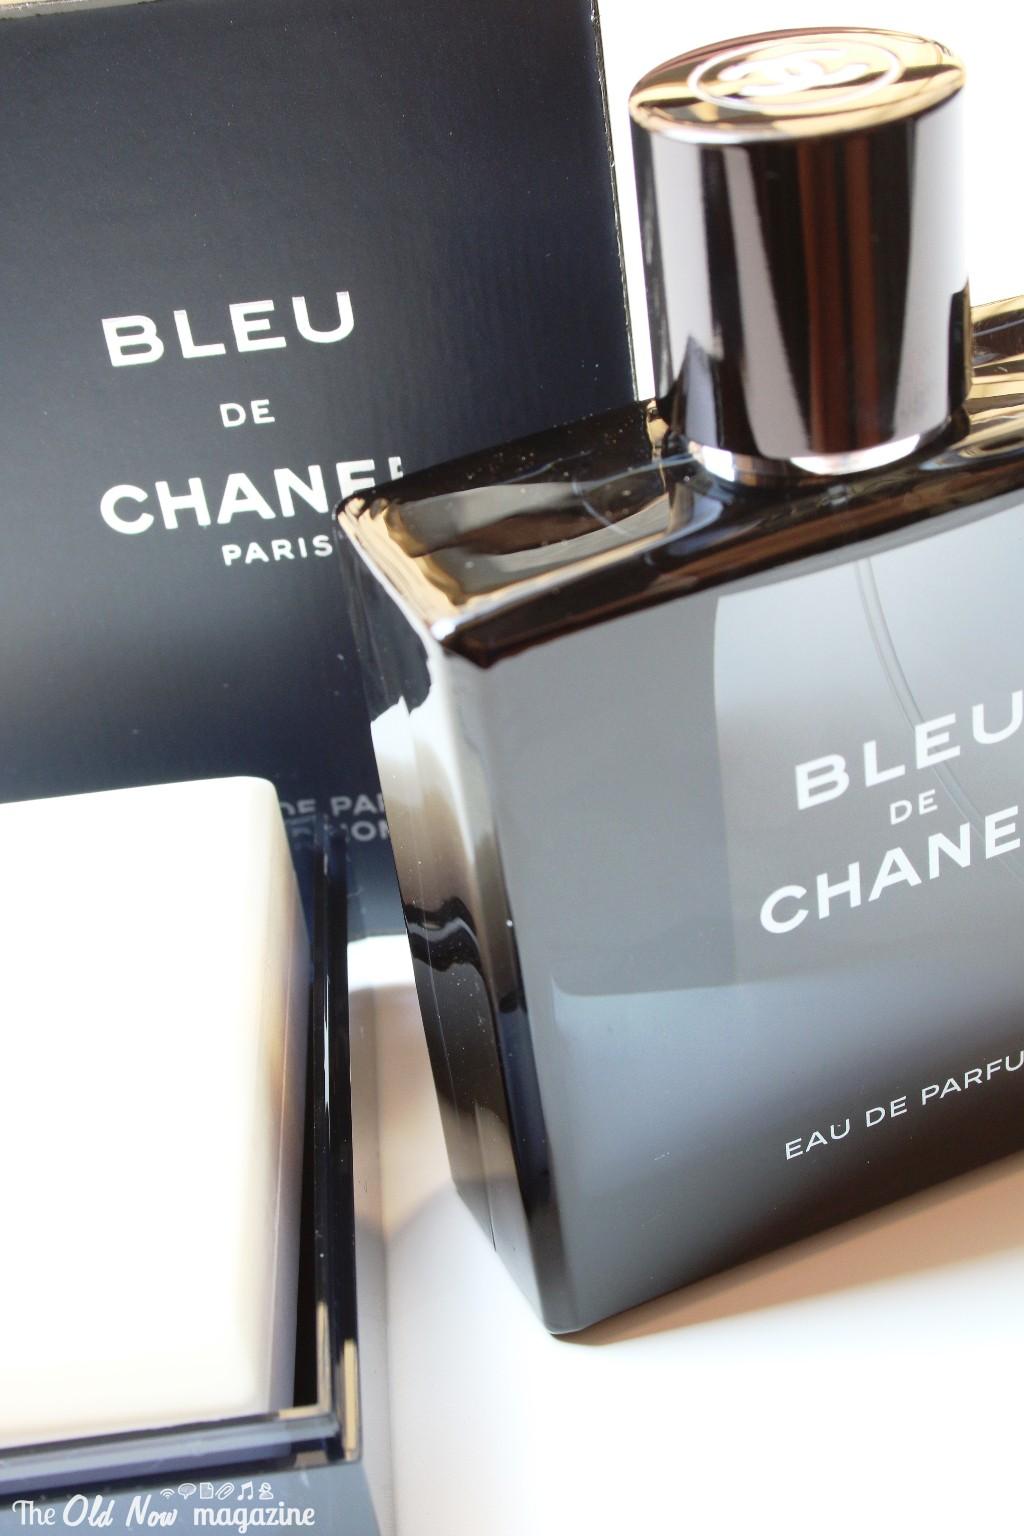 Bleu de Chanel CHANEL THEOLDNOW (8)